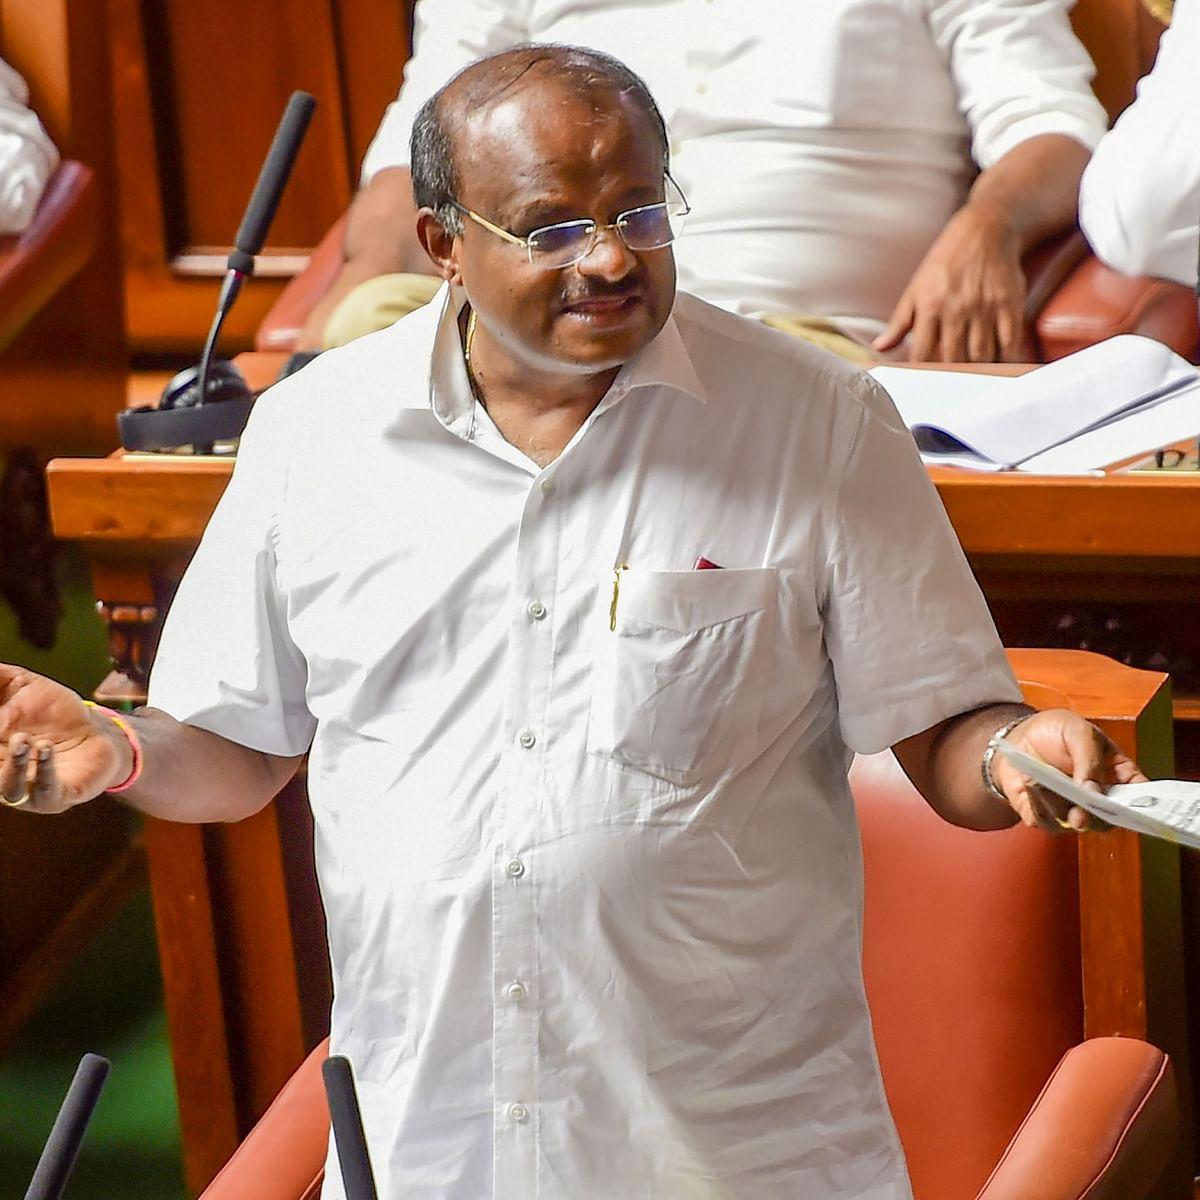 I worked like 'slave' for Congress for 14 months: Kumaraswamy